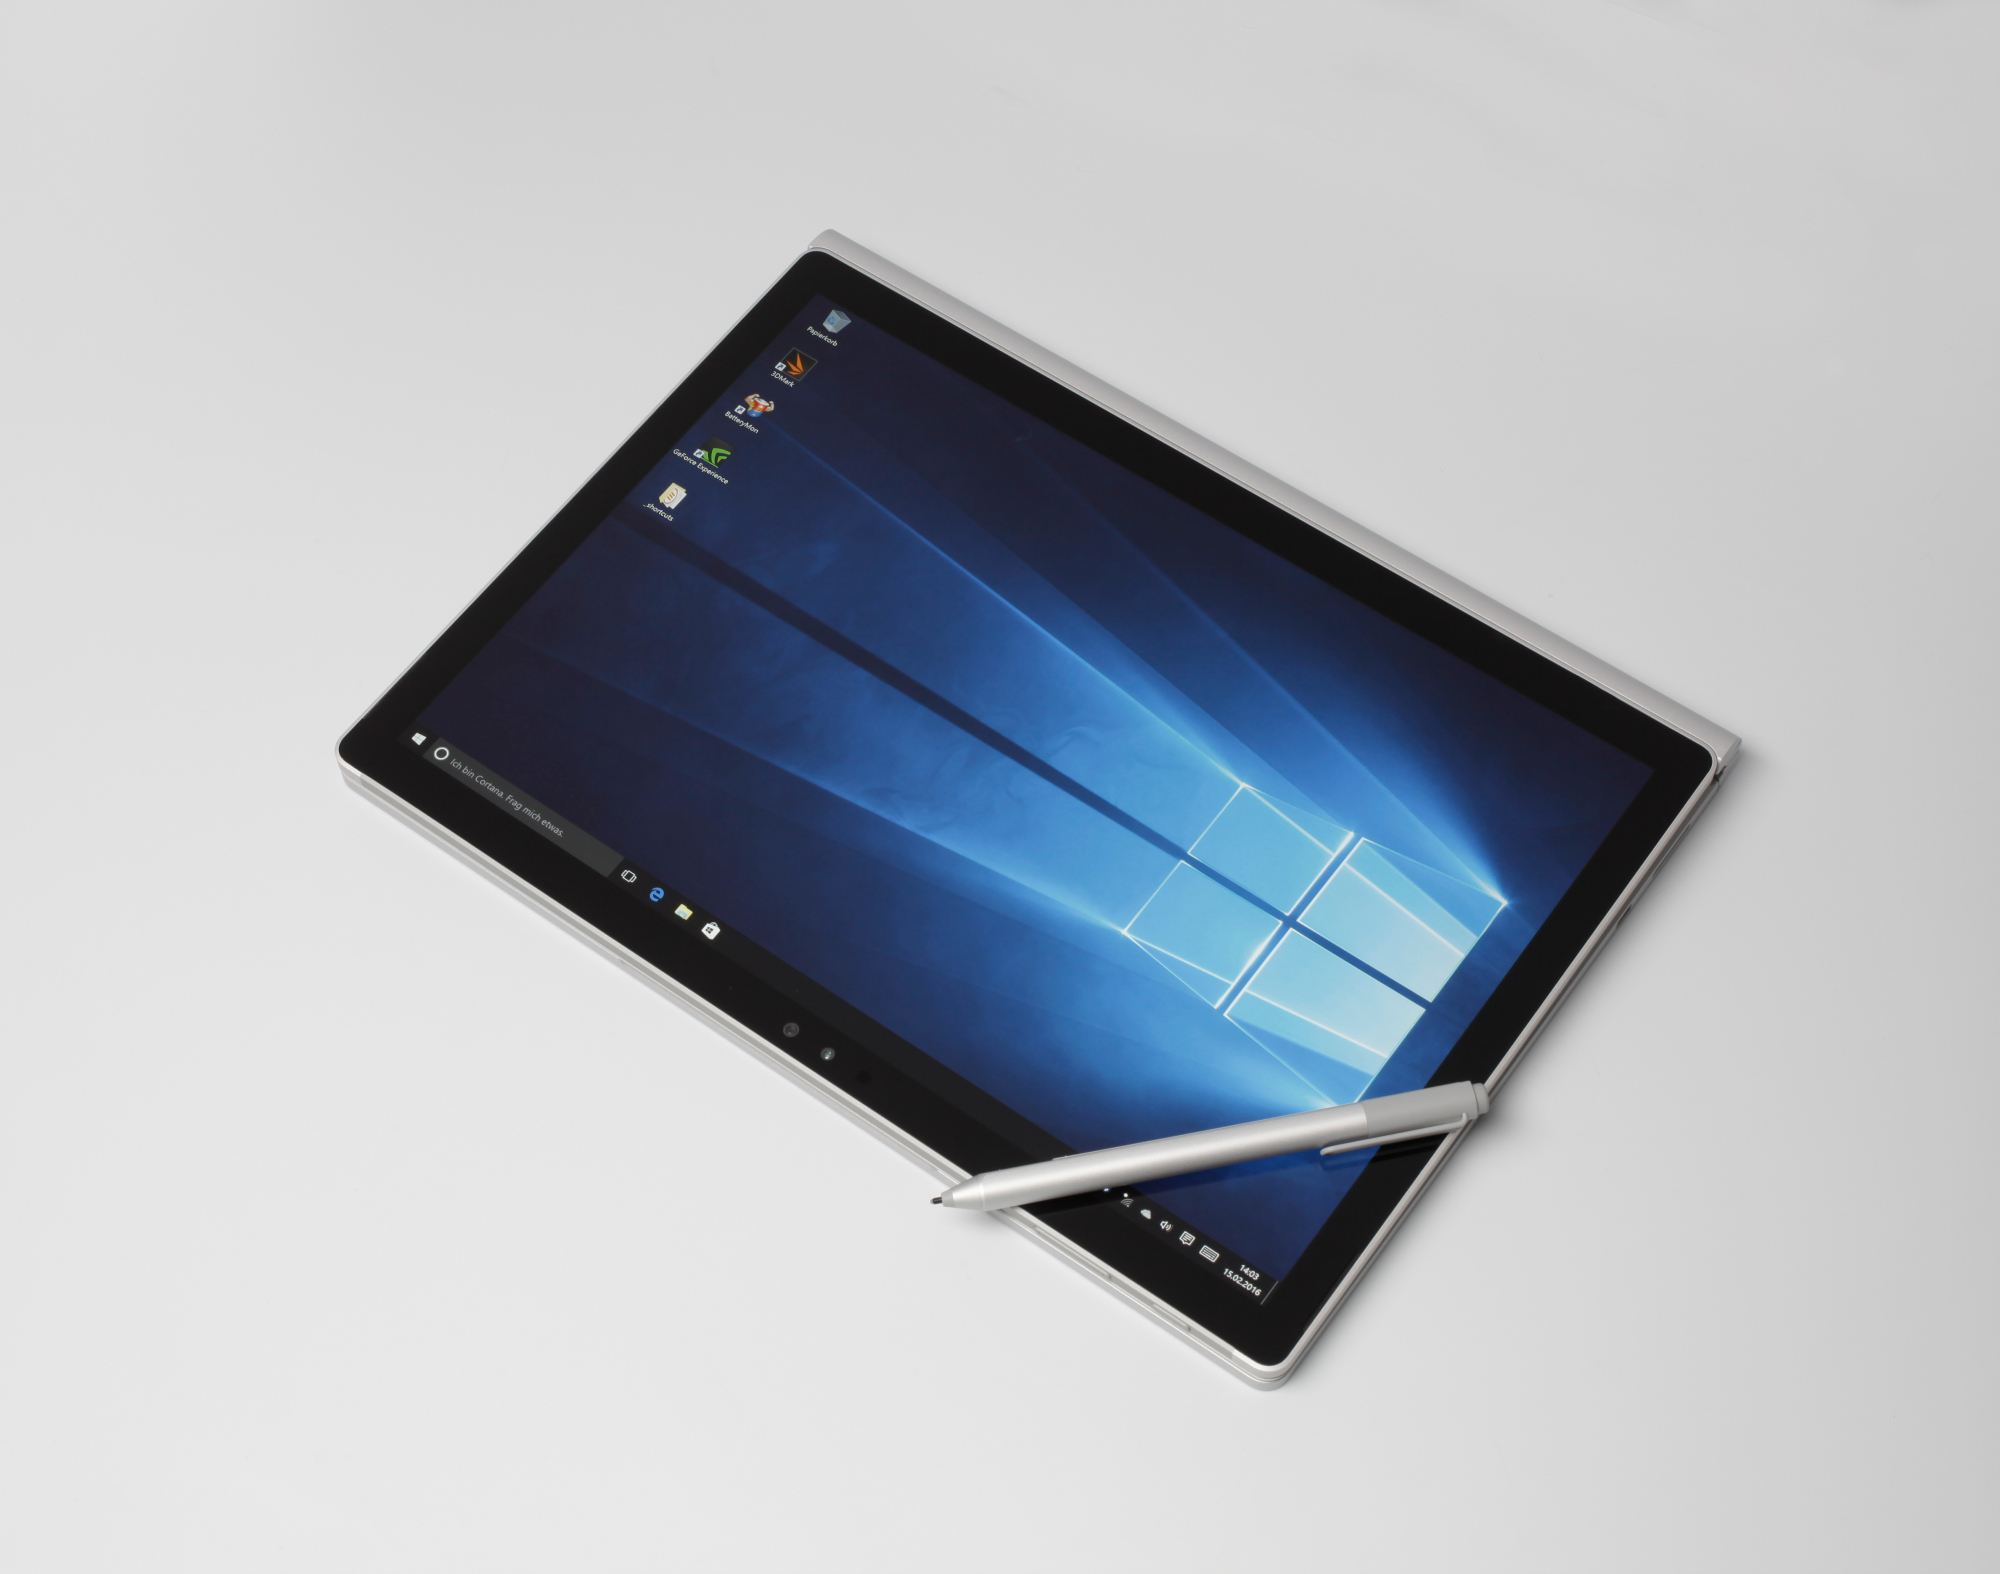 microsoft surface book edel laptop und windows tablet in einem c 39 t magazin. Black Bedroom Furniture Sets. Home Design Ideas